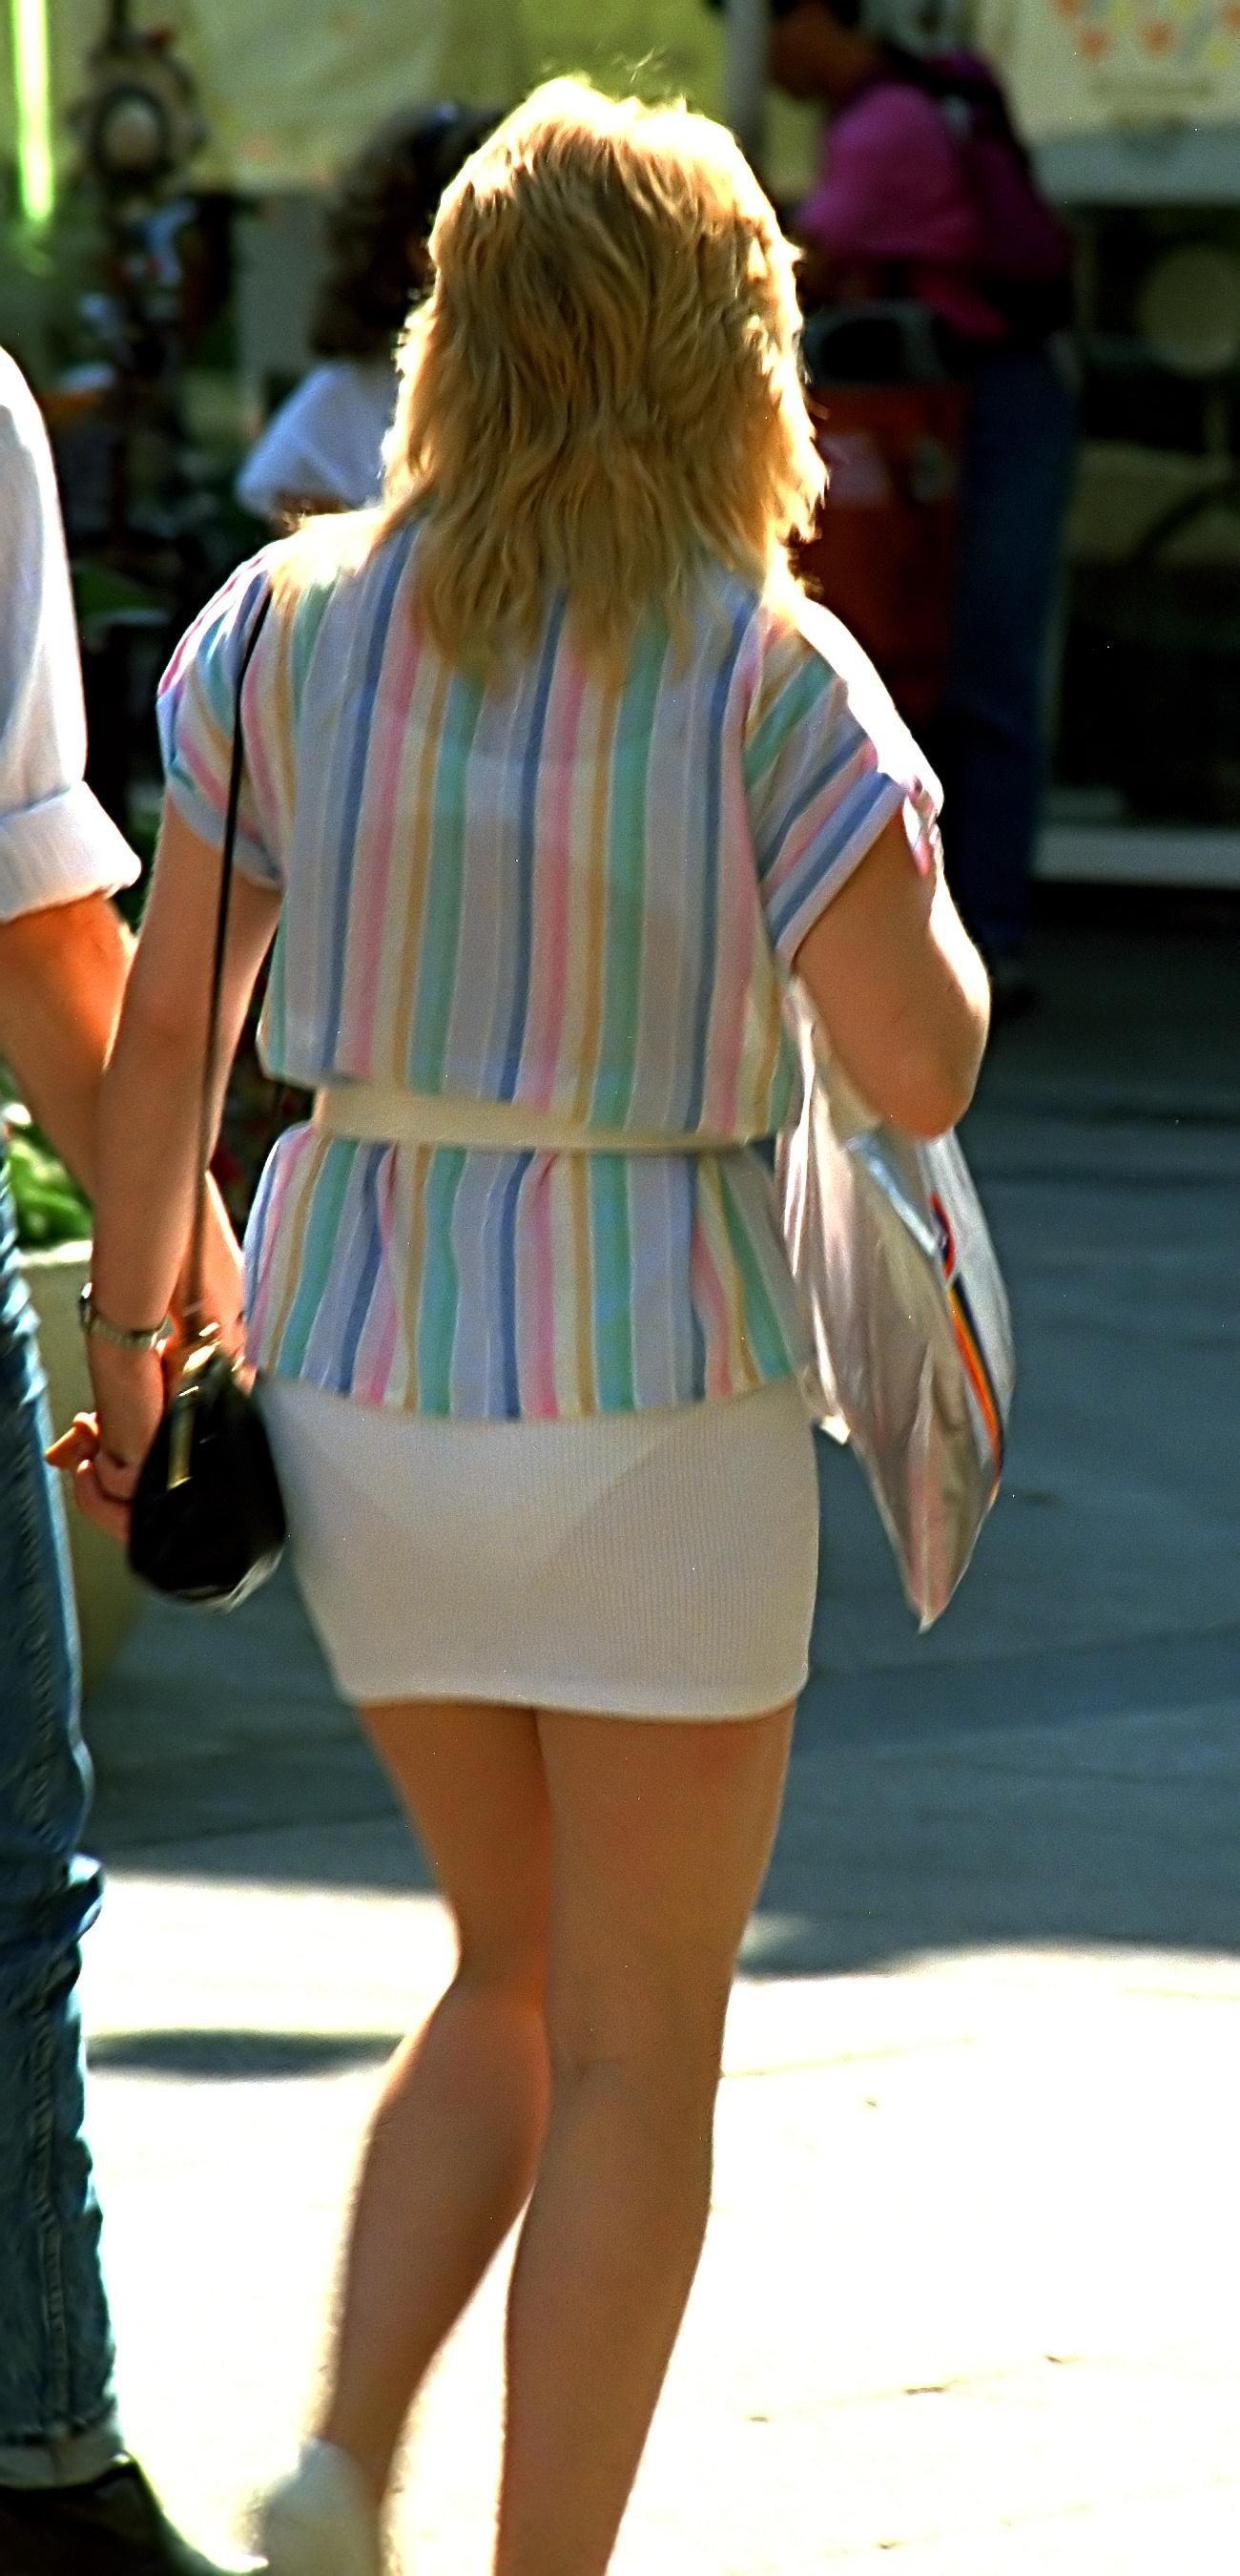 Public Panty Lines In#5